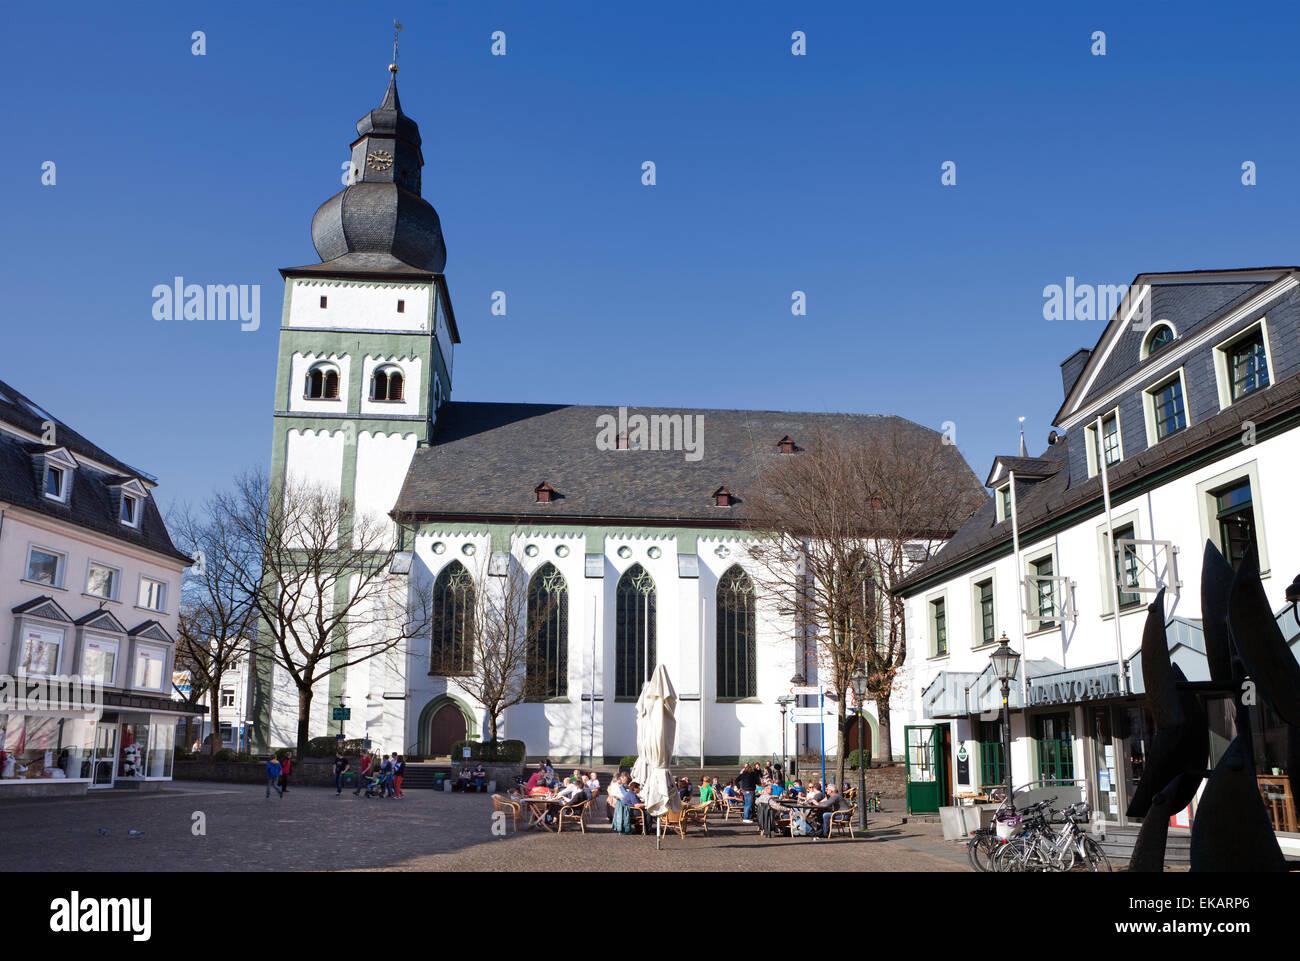 Parish church on the Alter Markt square, Hanseatic City of Attendorn, Sauerland region, North Rhine-Westphalia, - Stock Image